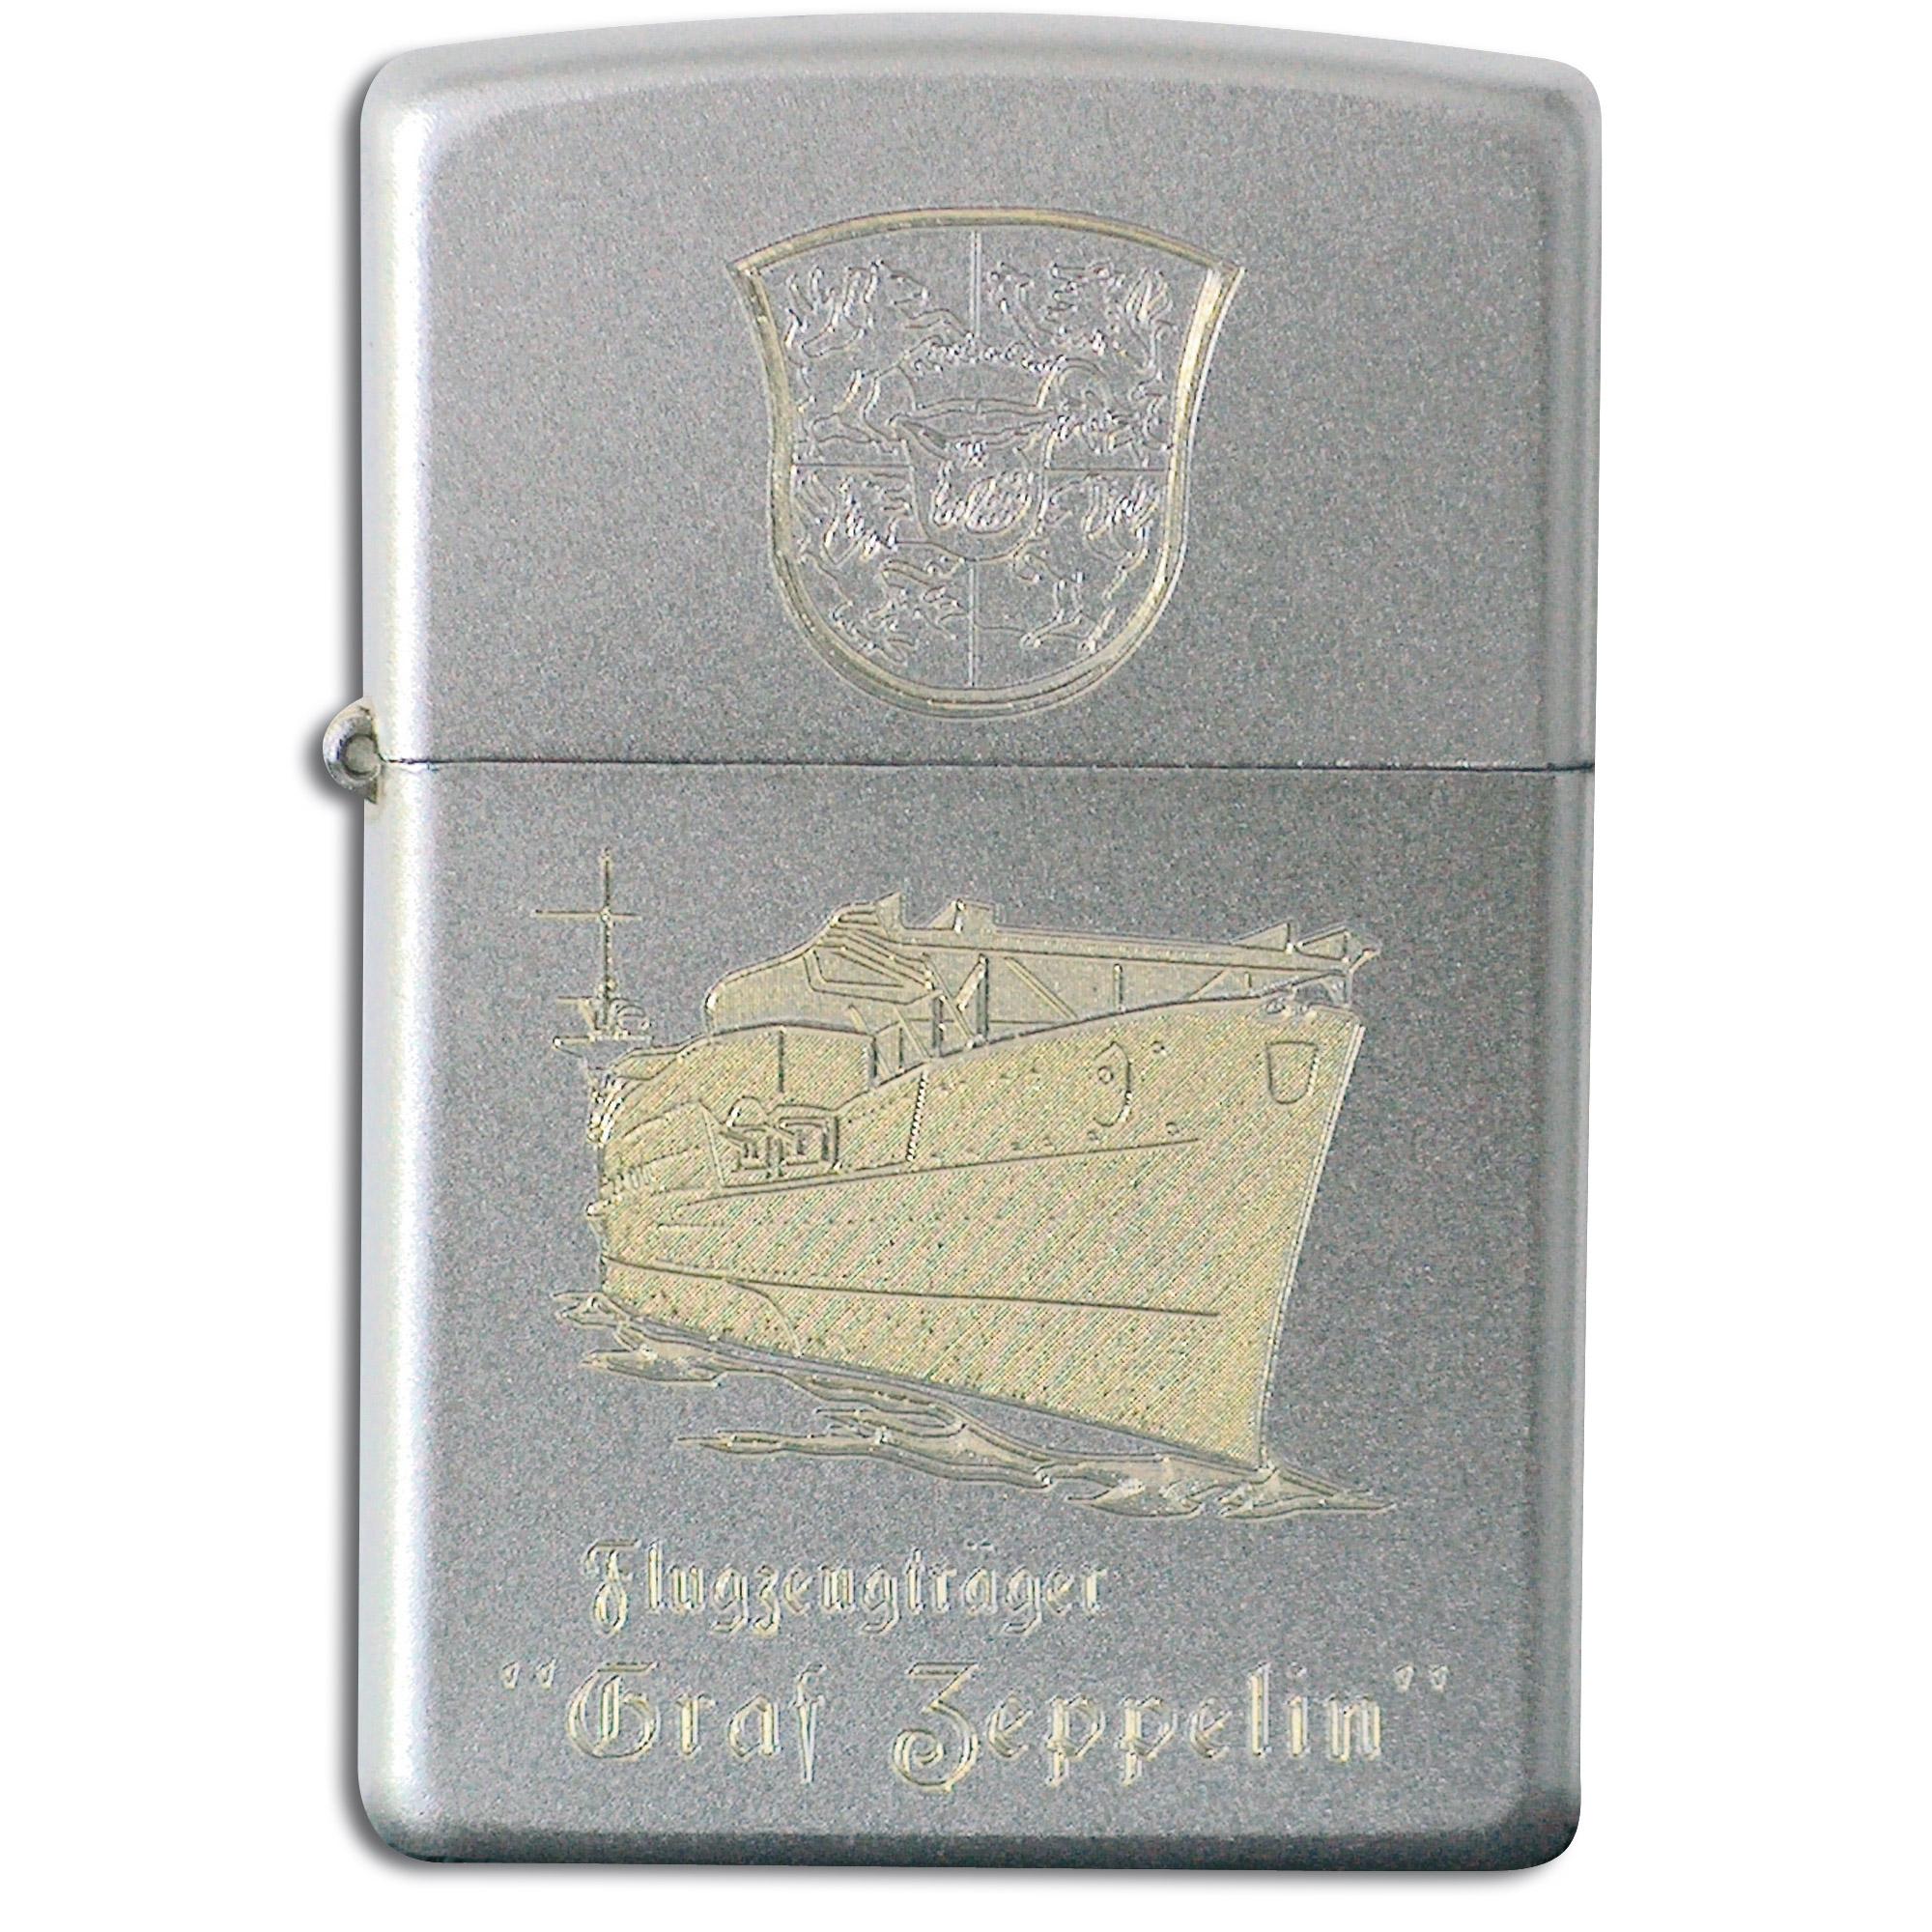 Zippo mit Gravur Graf Zeppelin